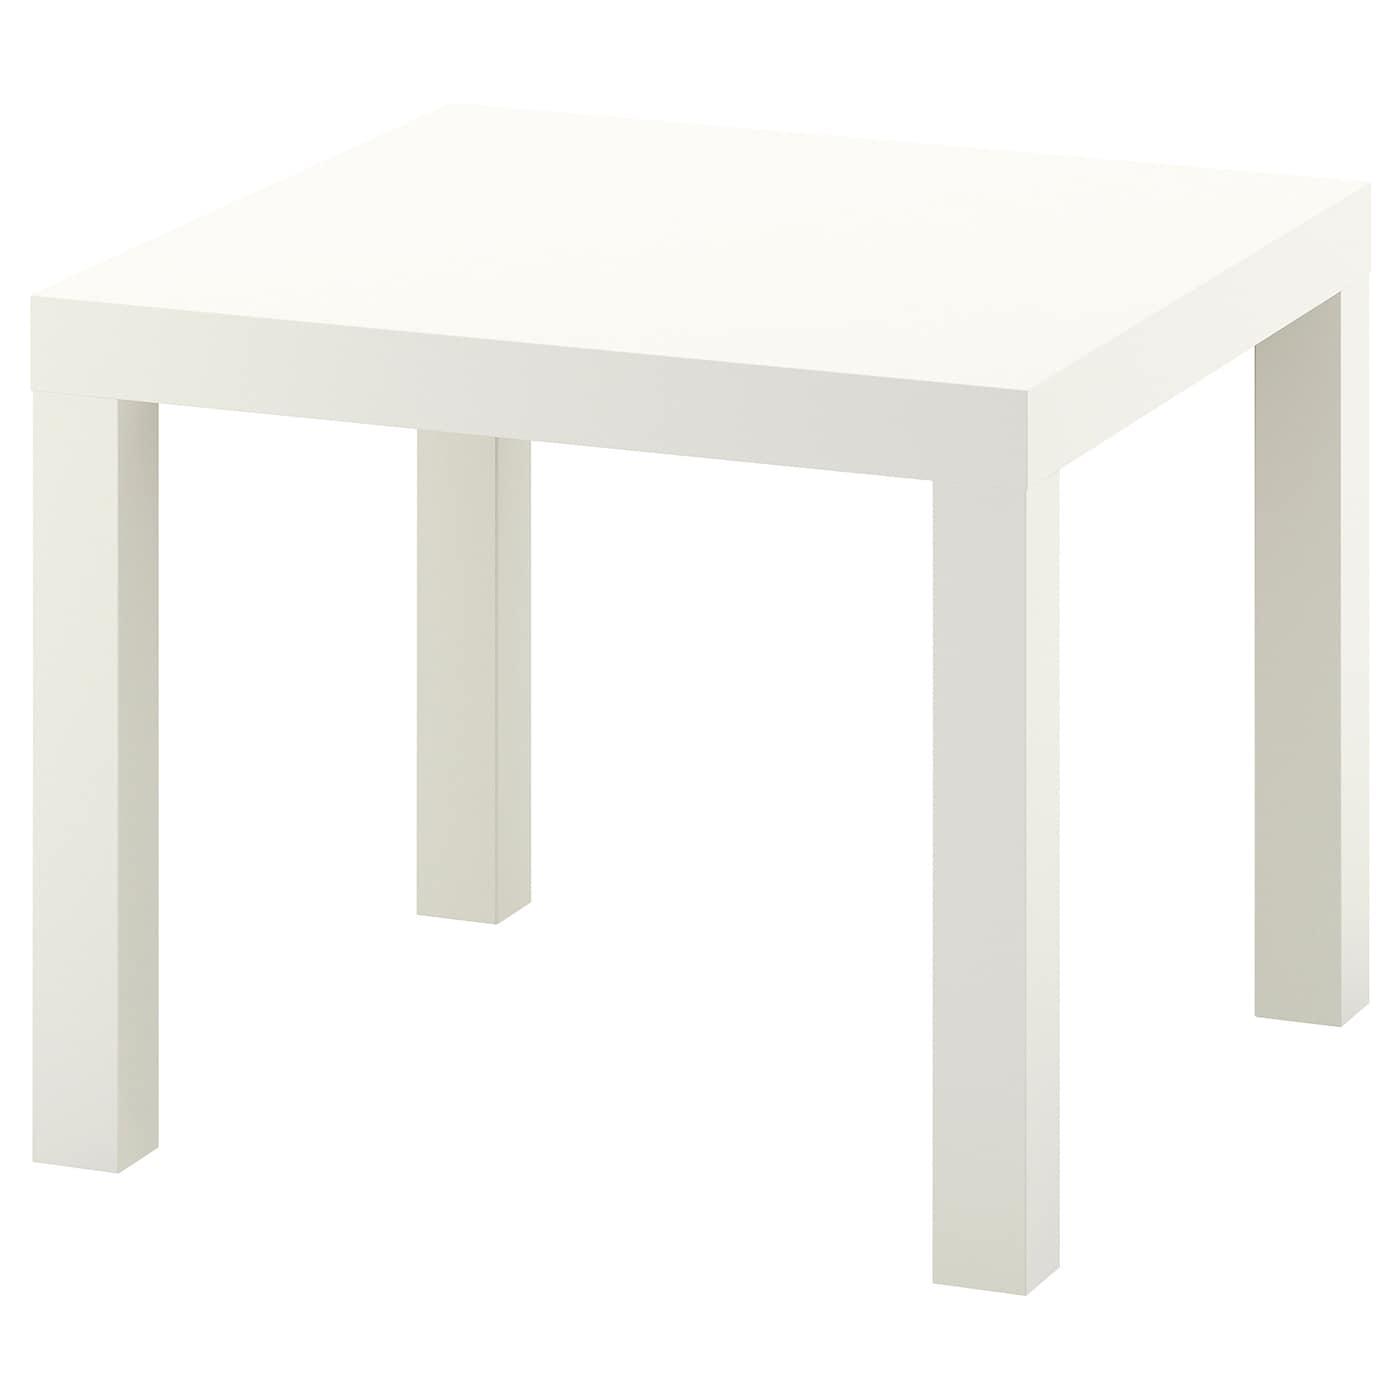 Lack White Side Table 55x55 Cm Ikea [ 1400 x 1400 Pixel ]